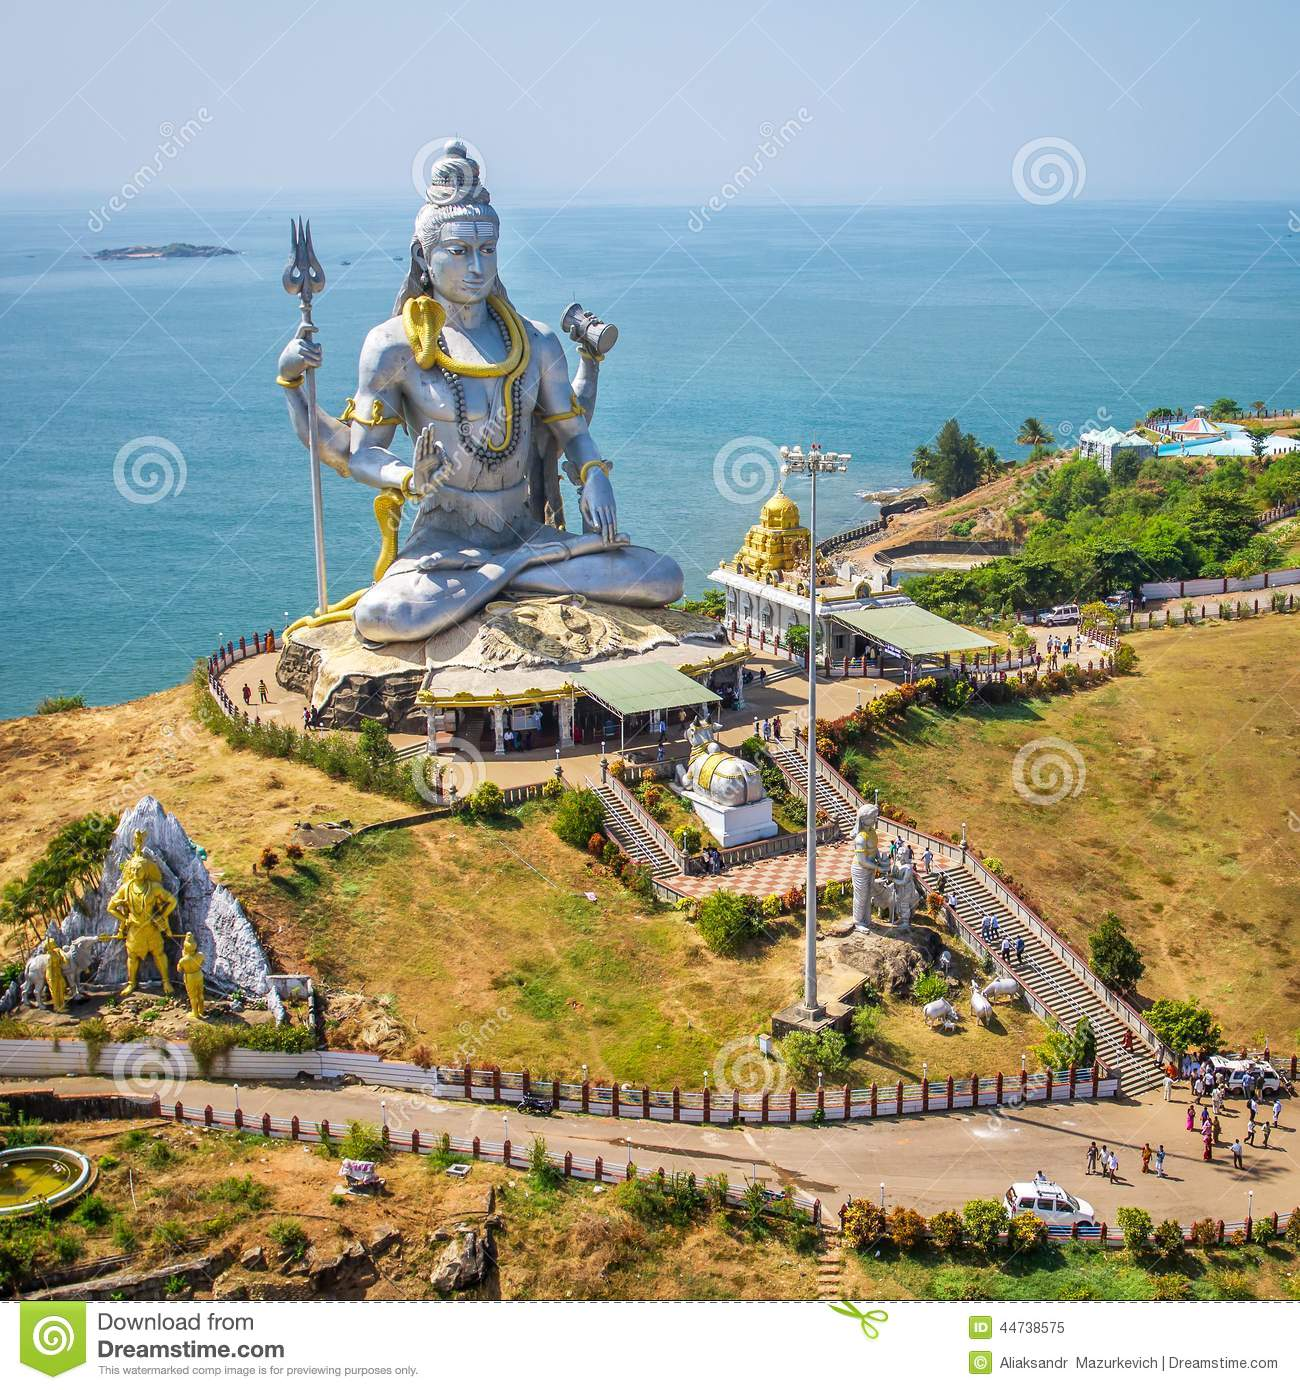 Statue Of Lord Shiva In Murudeshwar Temple Royalty Free Stock.